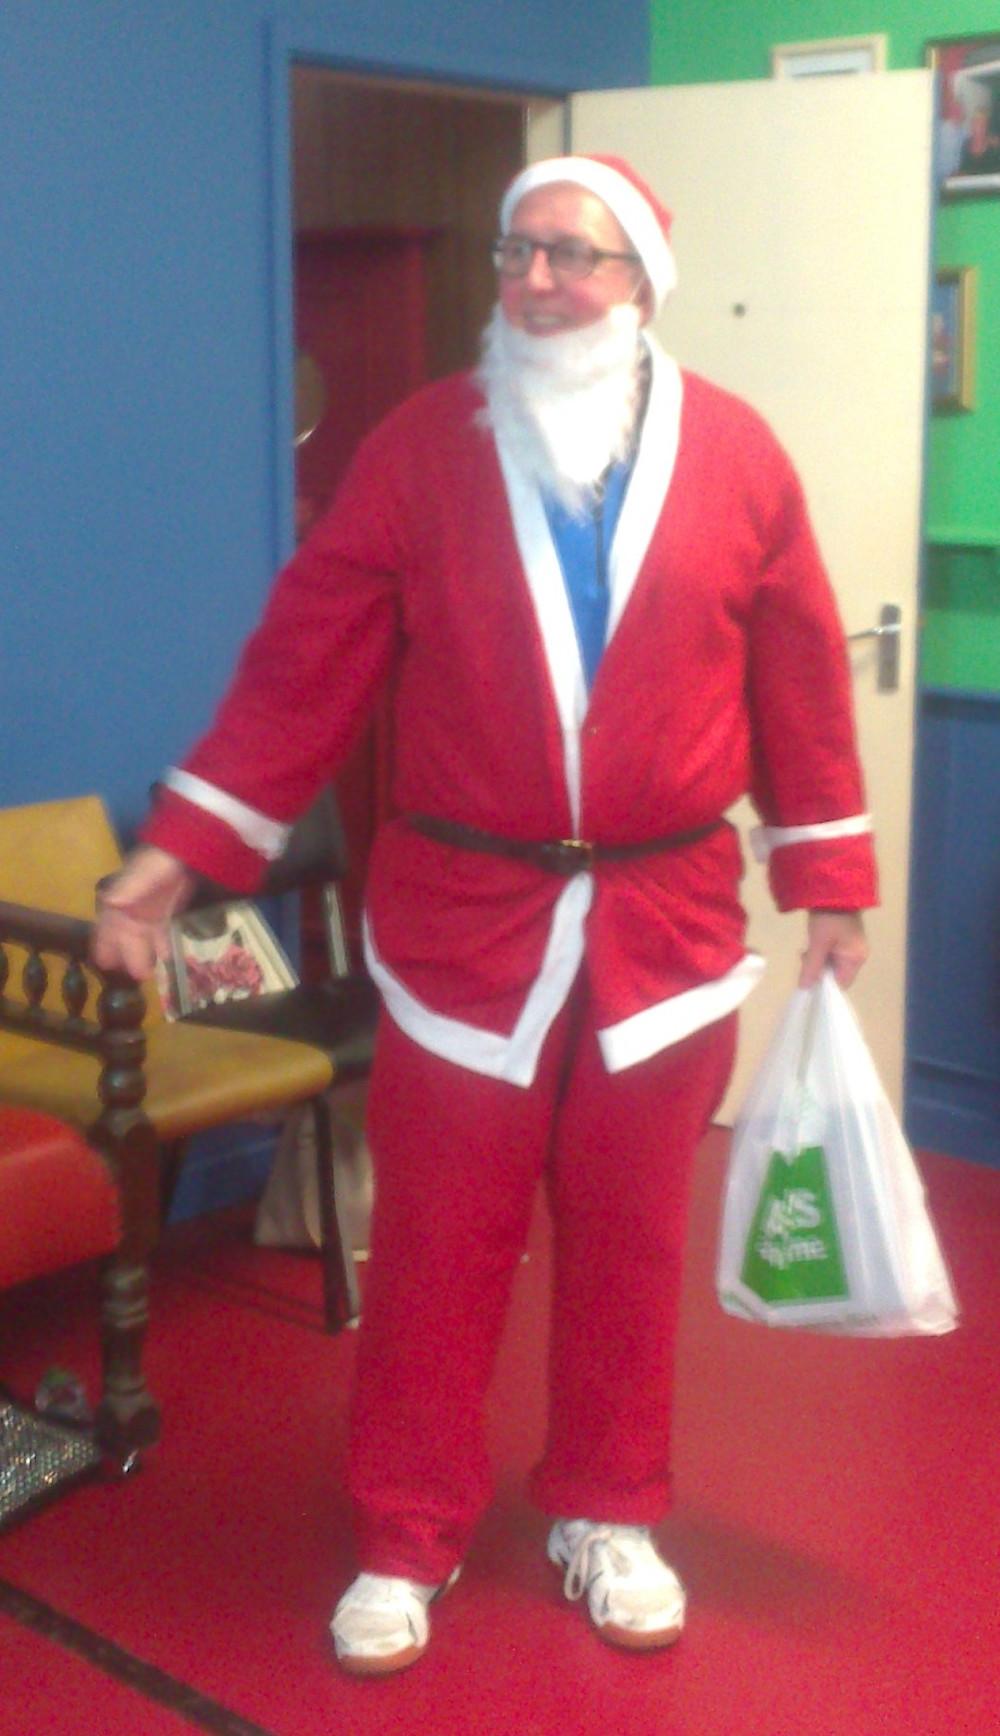 Even Santa helps make the day at Marine